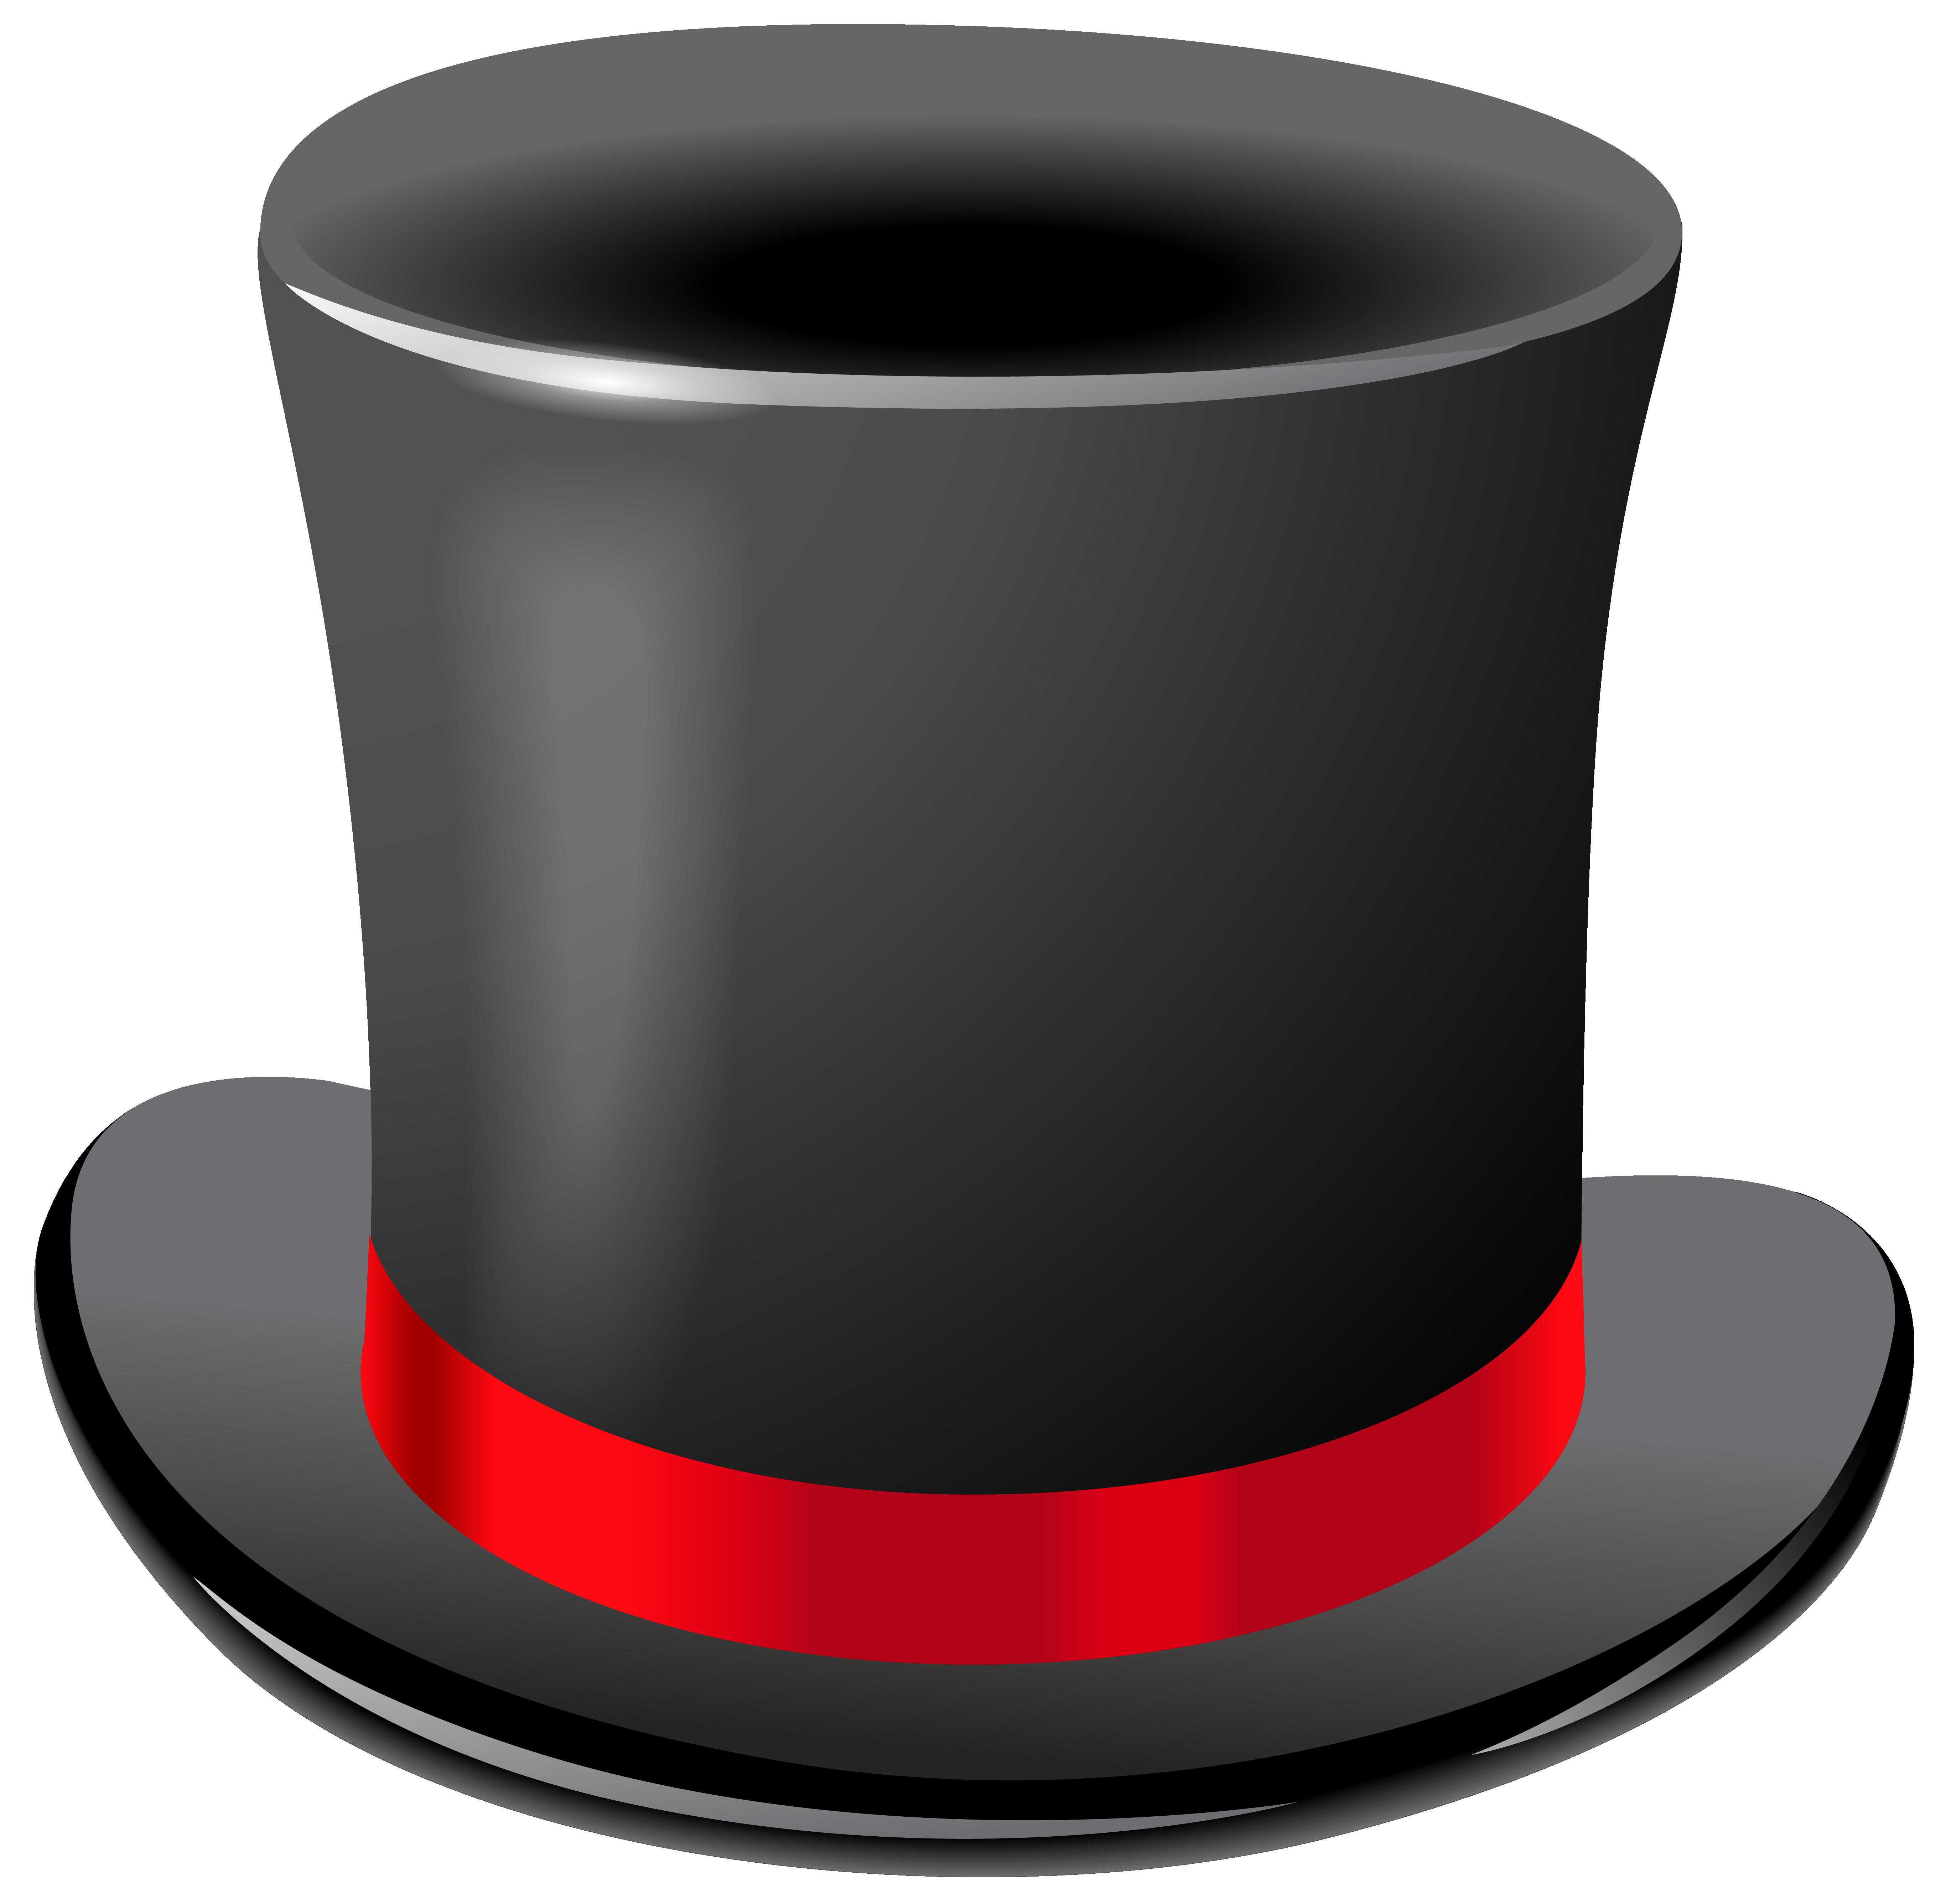 5463x5344 Drawn Top Hat Transparent